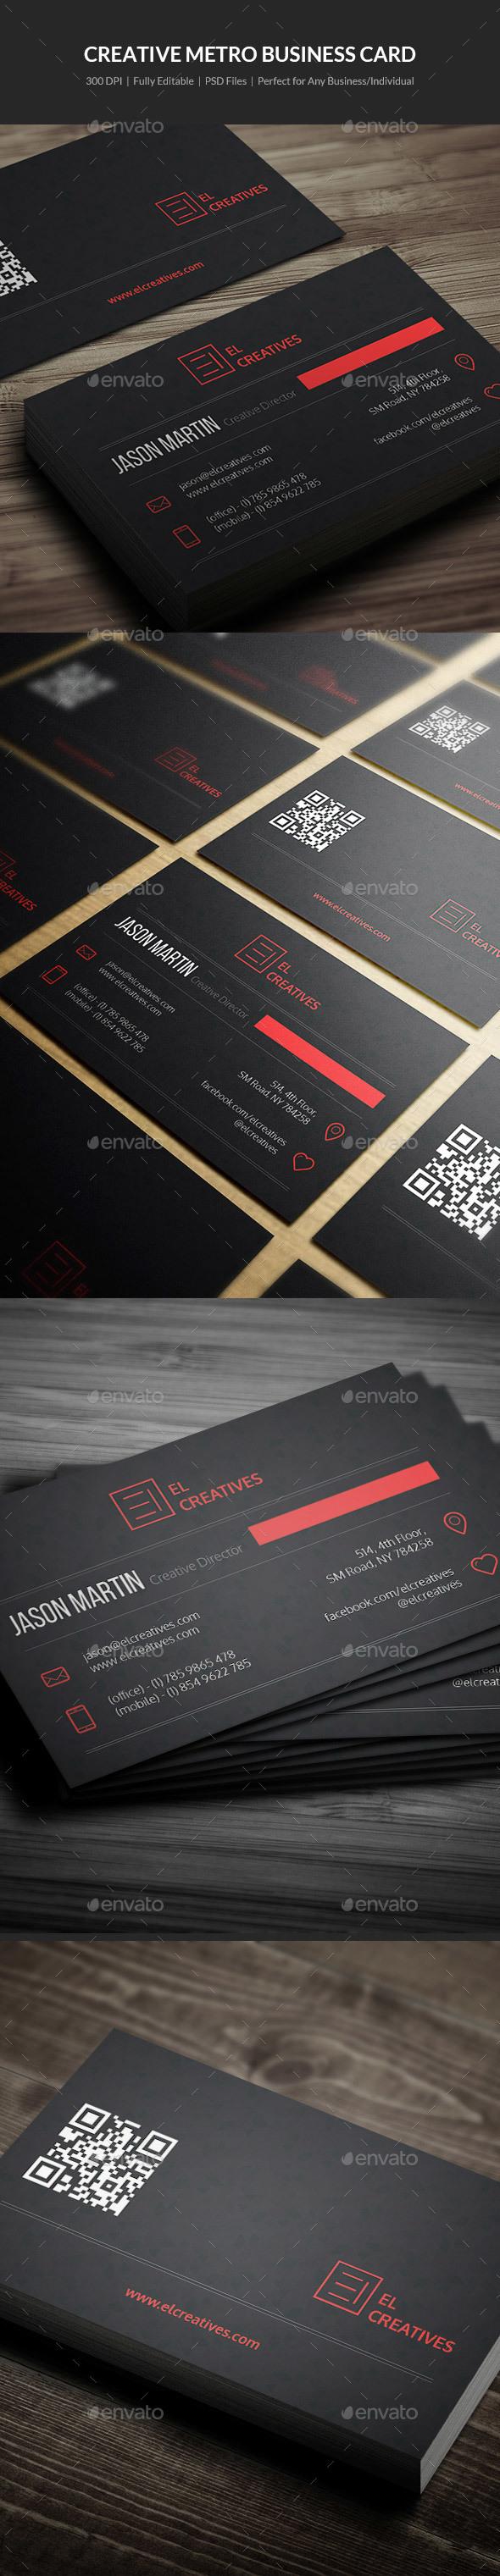 Dark Corporate Business Card - 17 - Corporate Business Cards